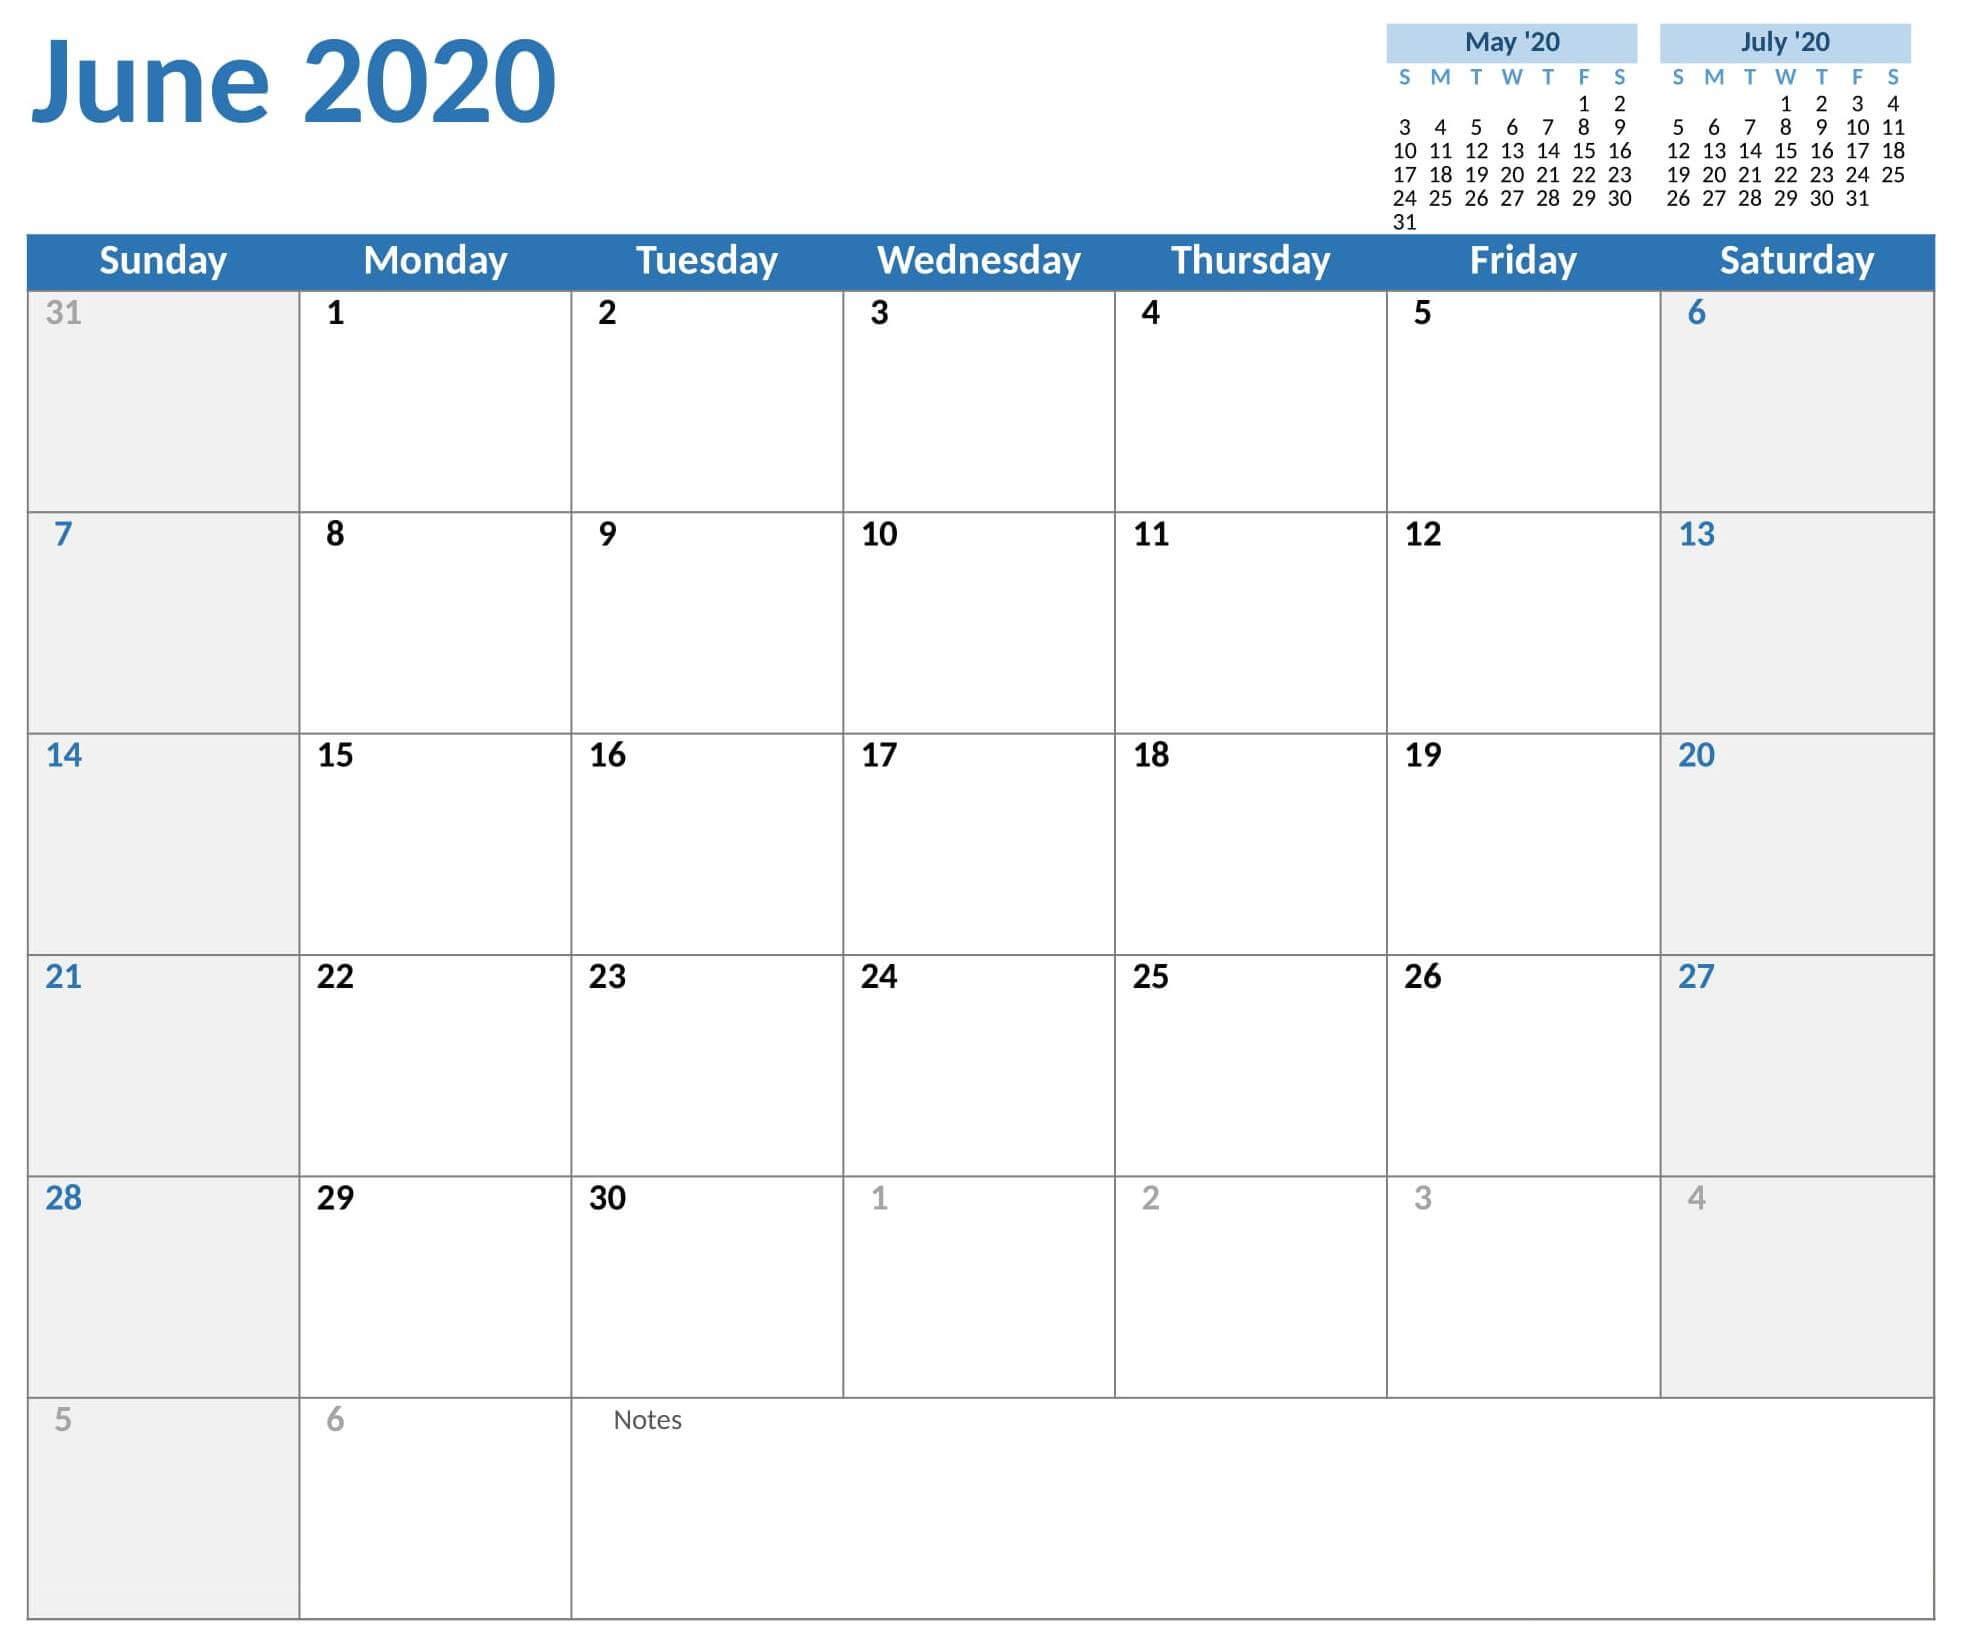 June 2020 Monthly Calendar Template